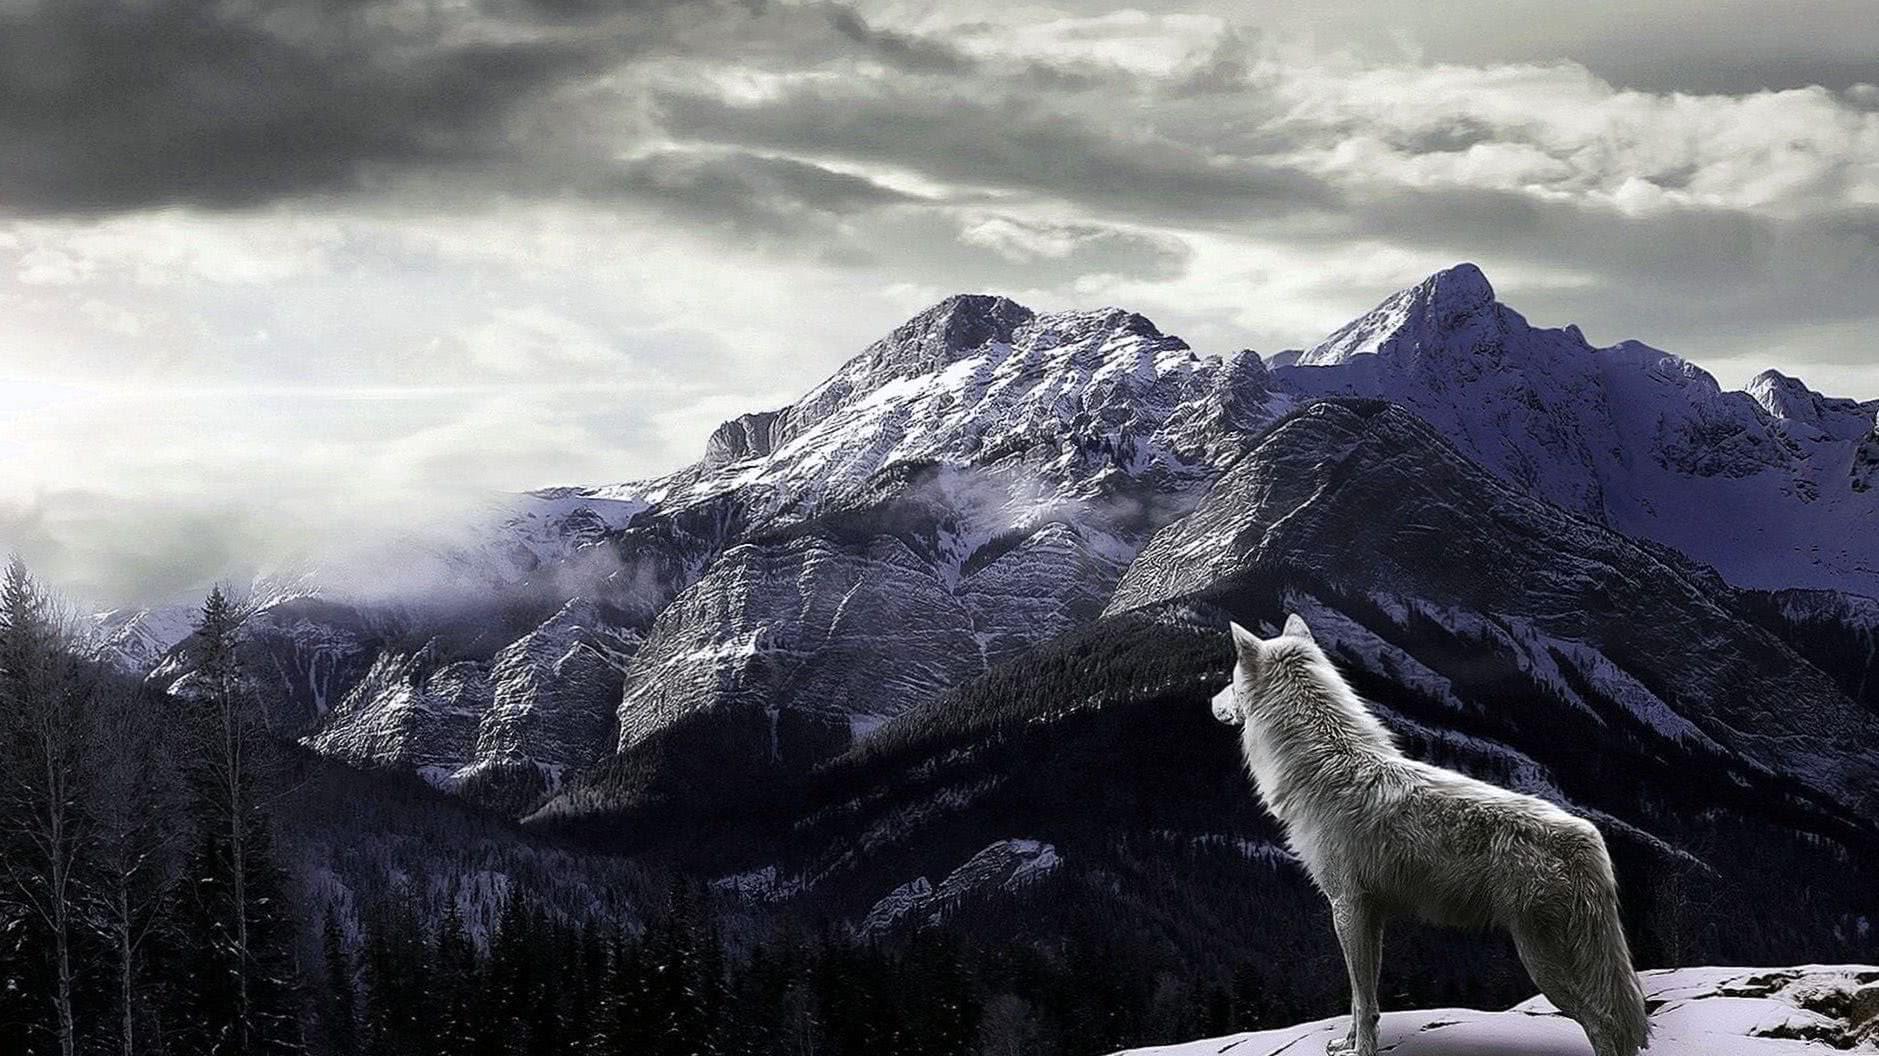 Full HD 4K Wolf Wallpaper